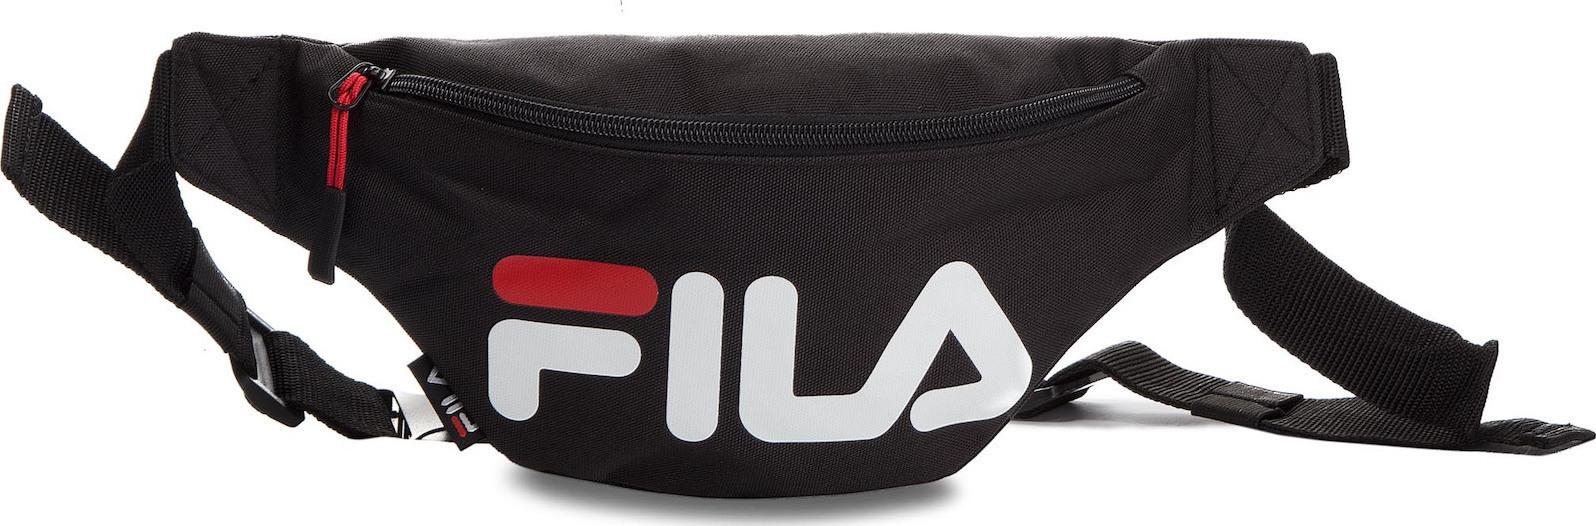 fd63e1aa6fb6 Προσθήκη στα αγαπημένα menu Fila Waist Bag Slim 685003-002